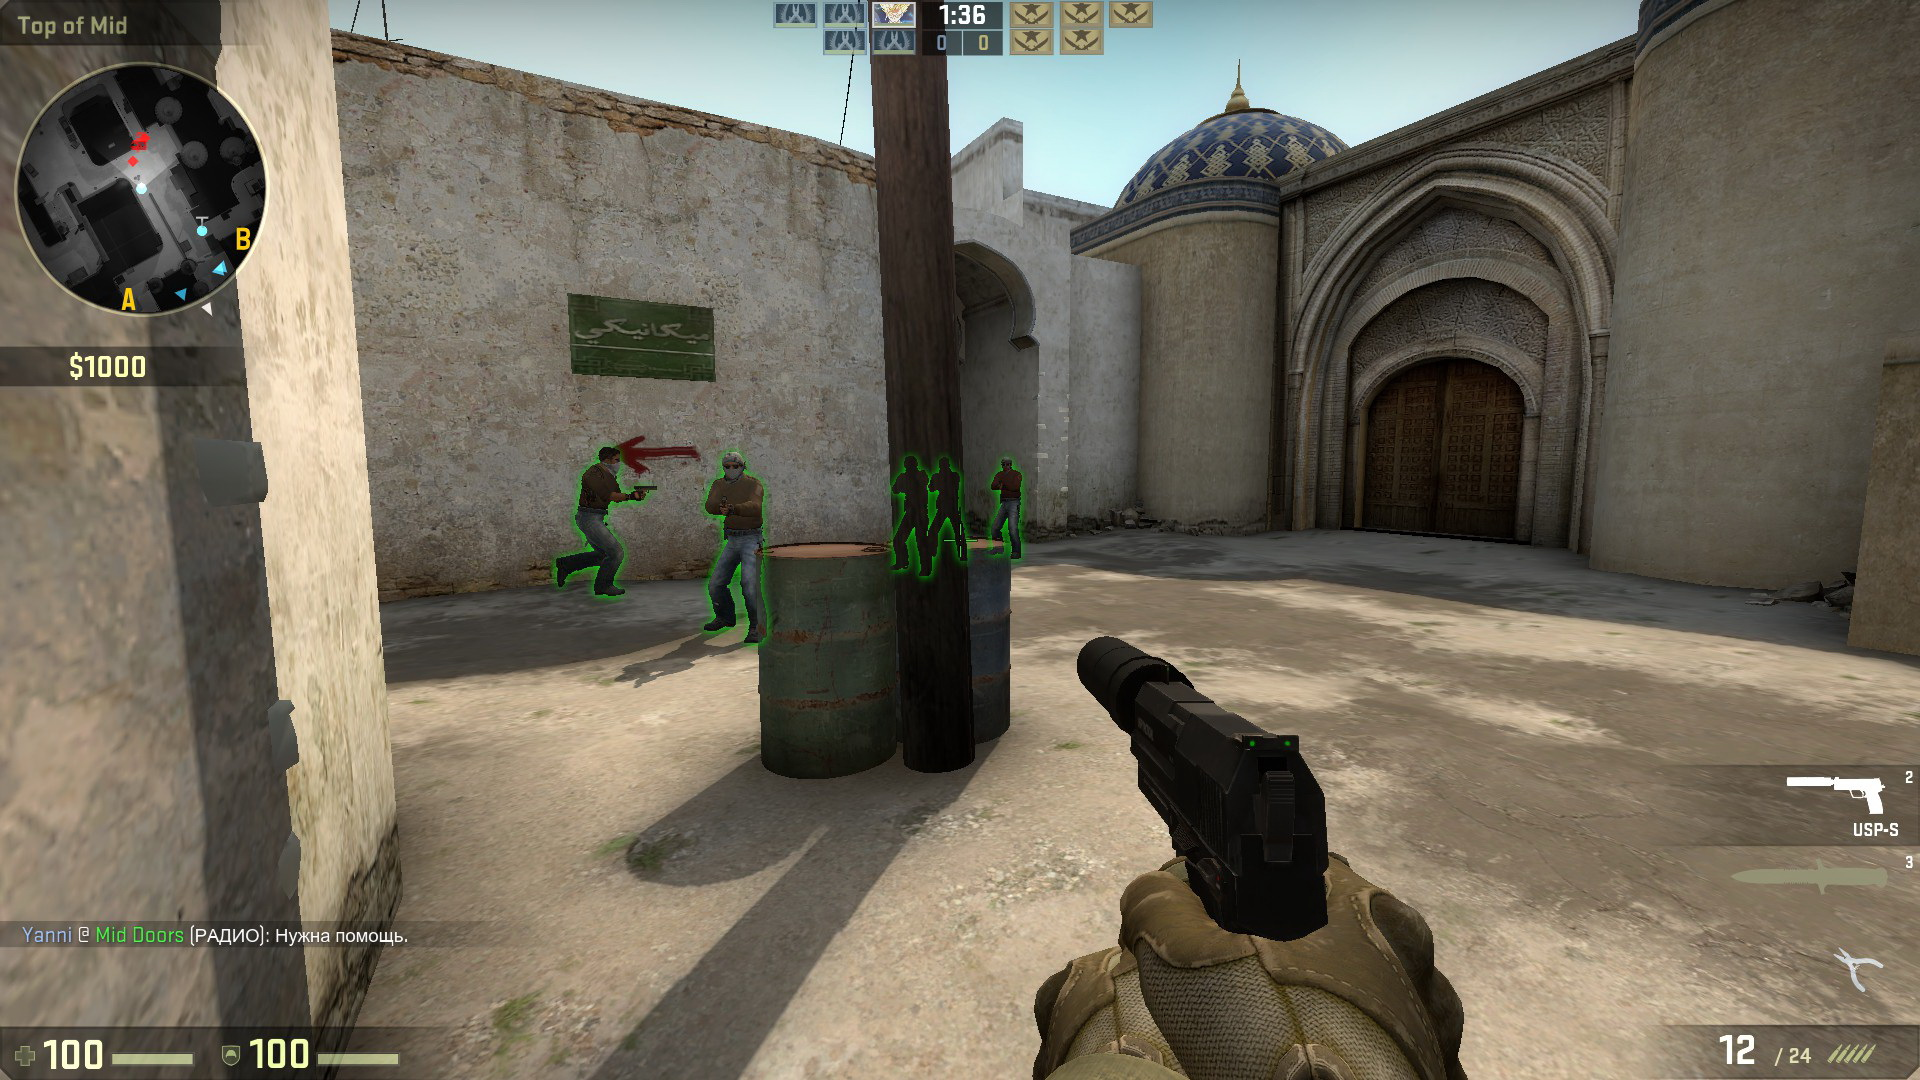 Fitur : - misi mayor f1 - weapon hack f2 - wall shoot alt kiri source